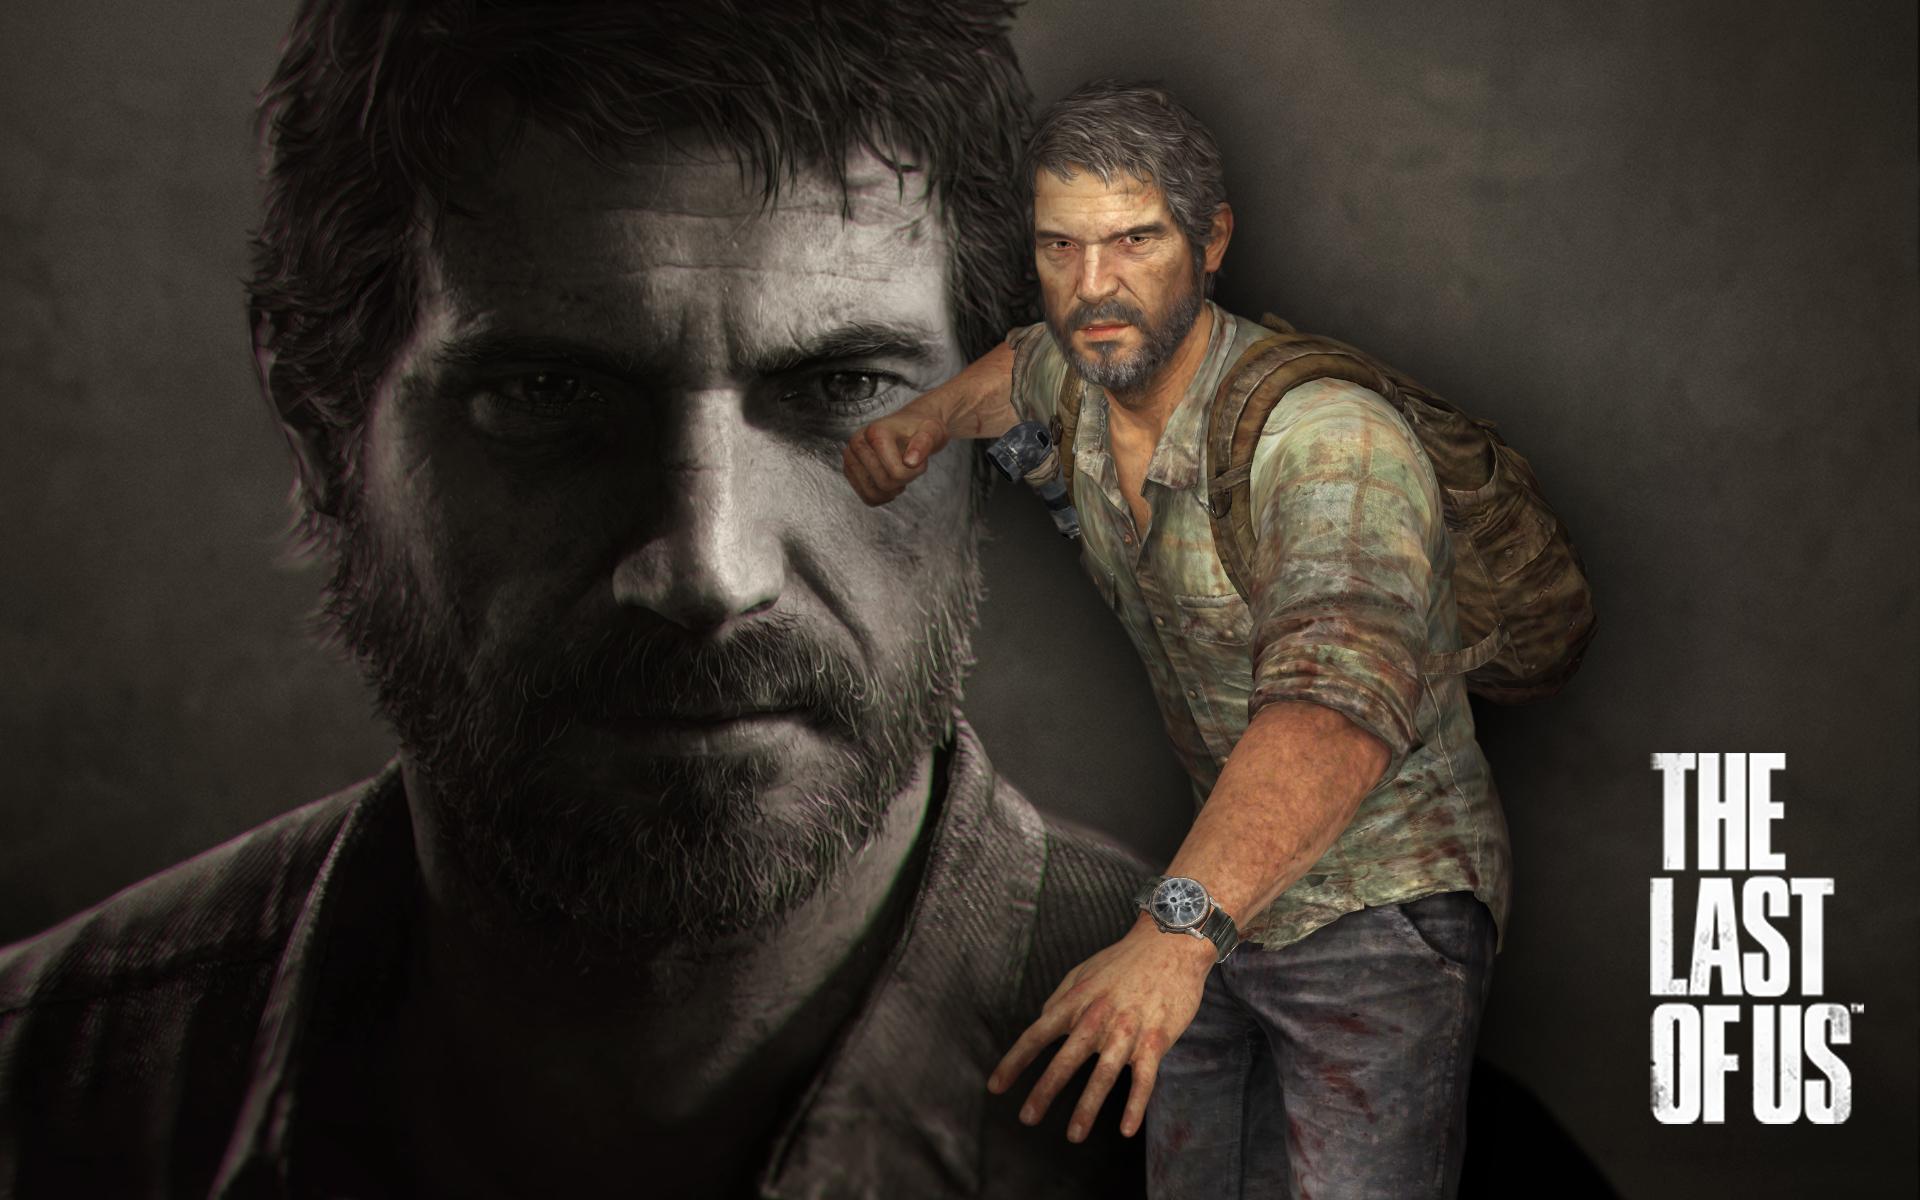 The Last Of Us - Joel (original) by junkymana on DeviantArt